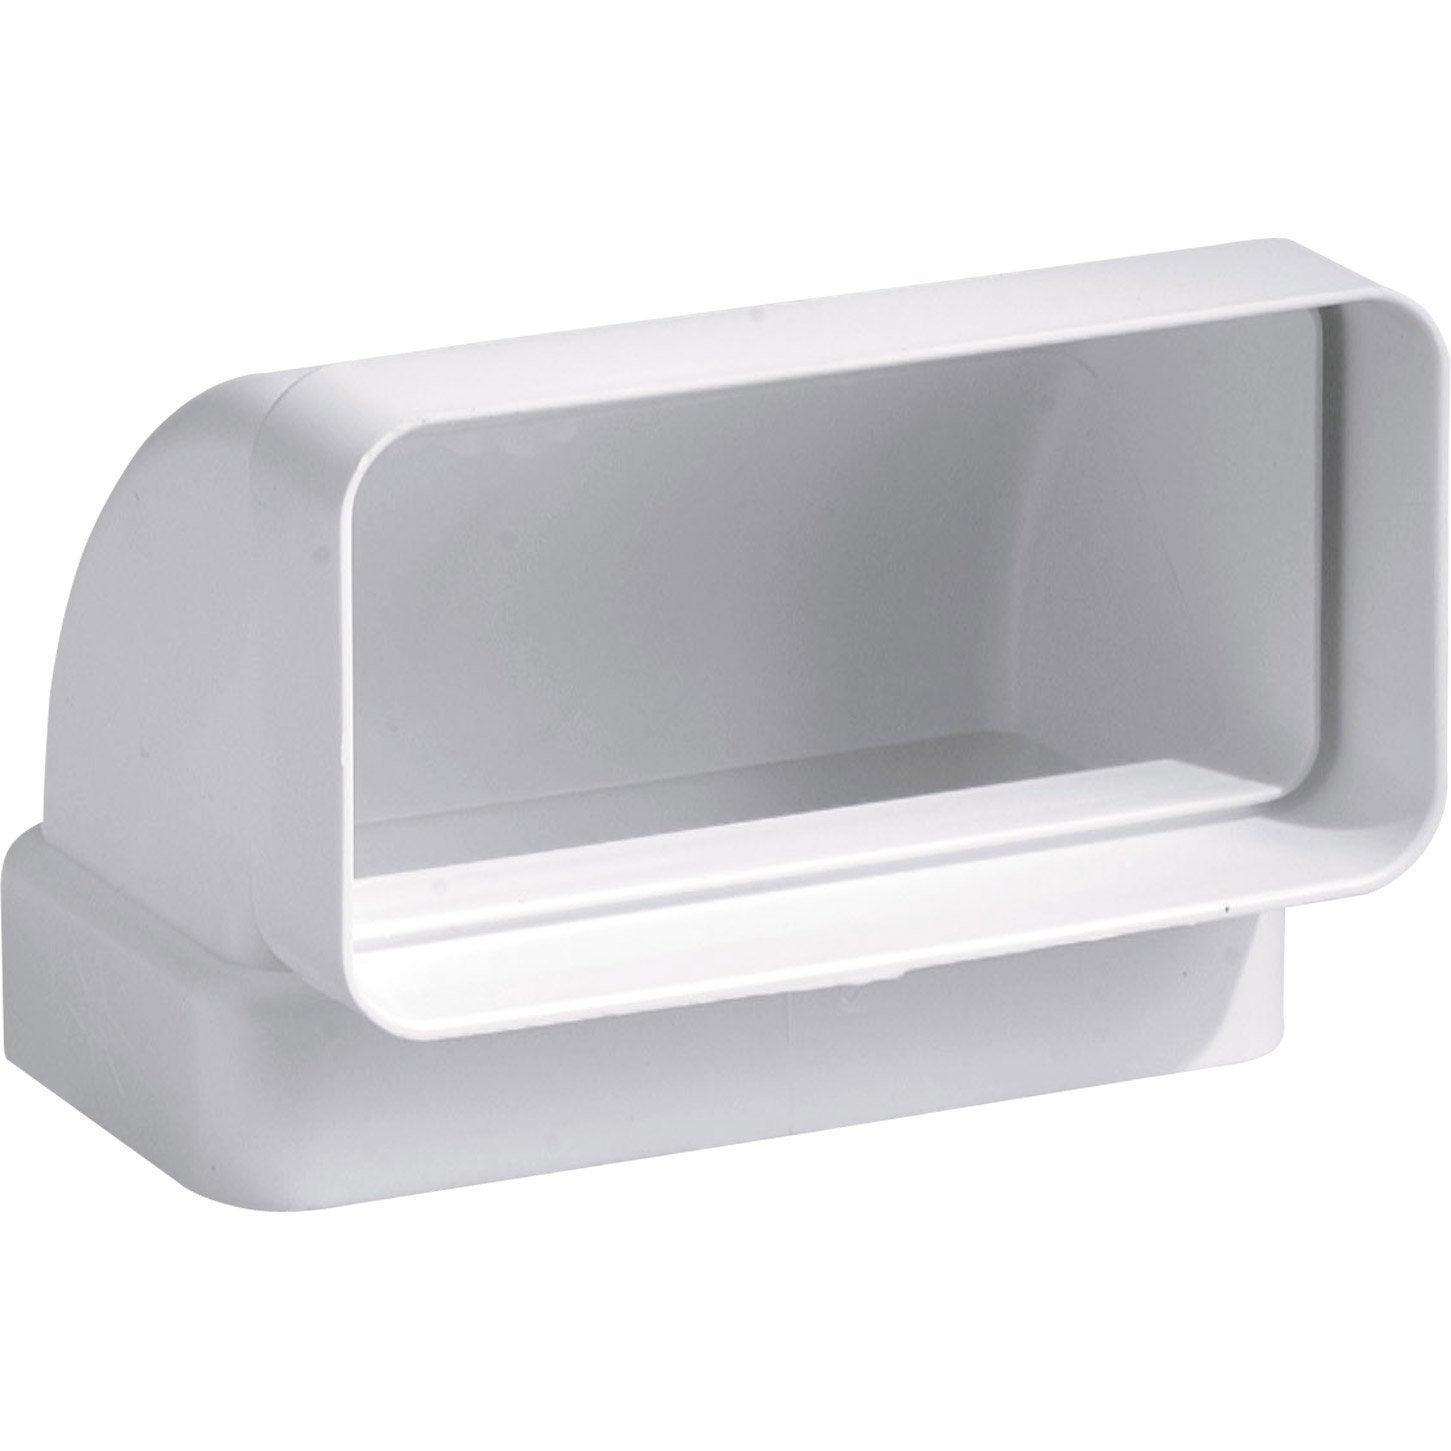 coude 90 rectangulaire vertical pvc s p mm cvr100 leroy merlin. Black Bedroom Furniture Sets. Home Design Ideas